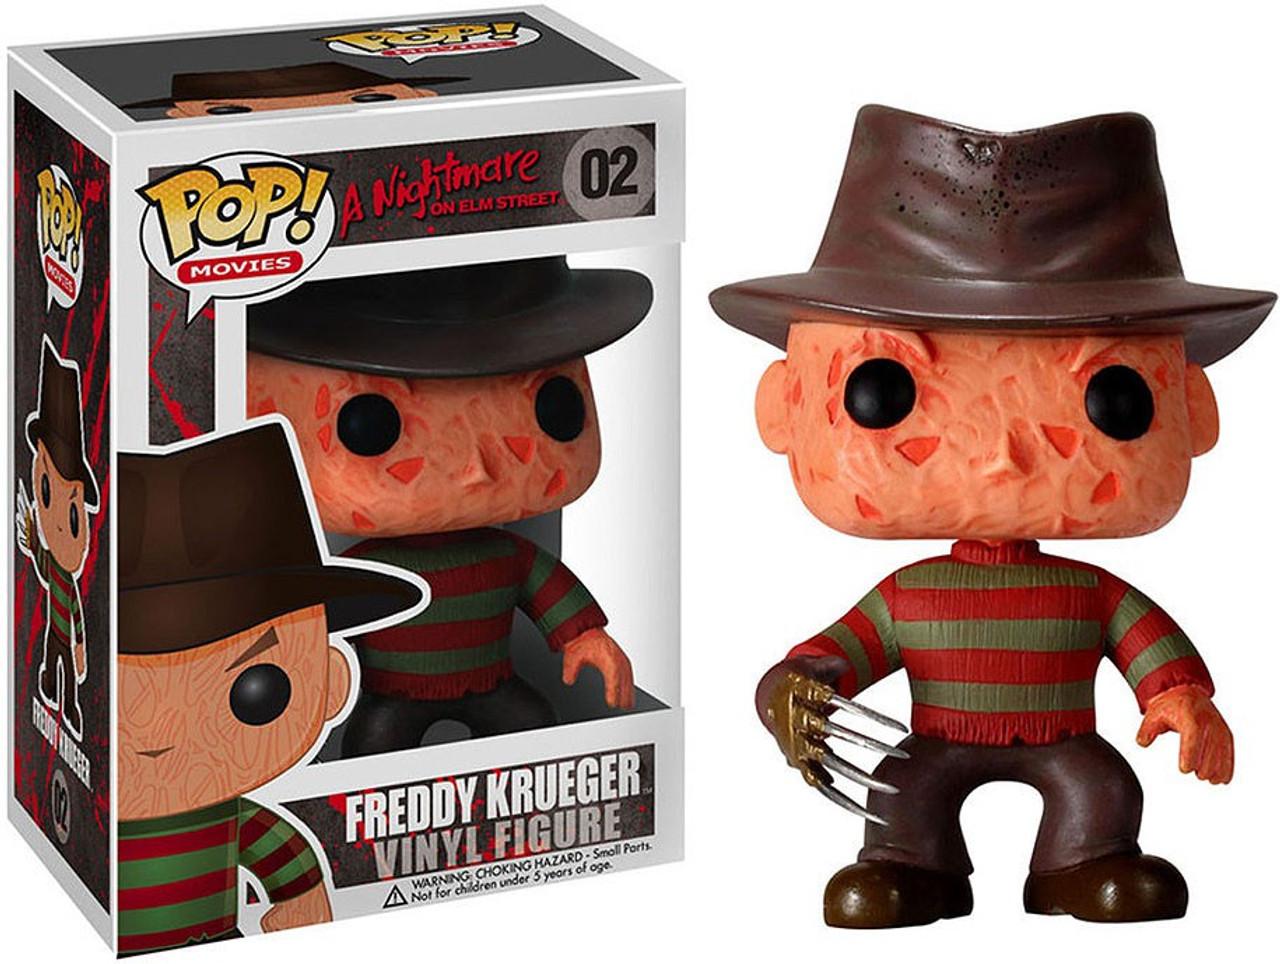 A Nightmare on Elm Street Funko POP! Movies Freddy Krueger Vinyl Figure #02